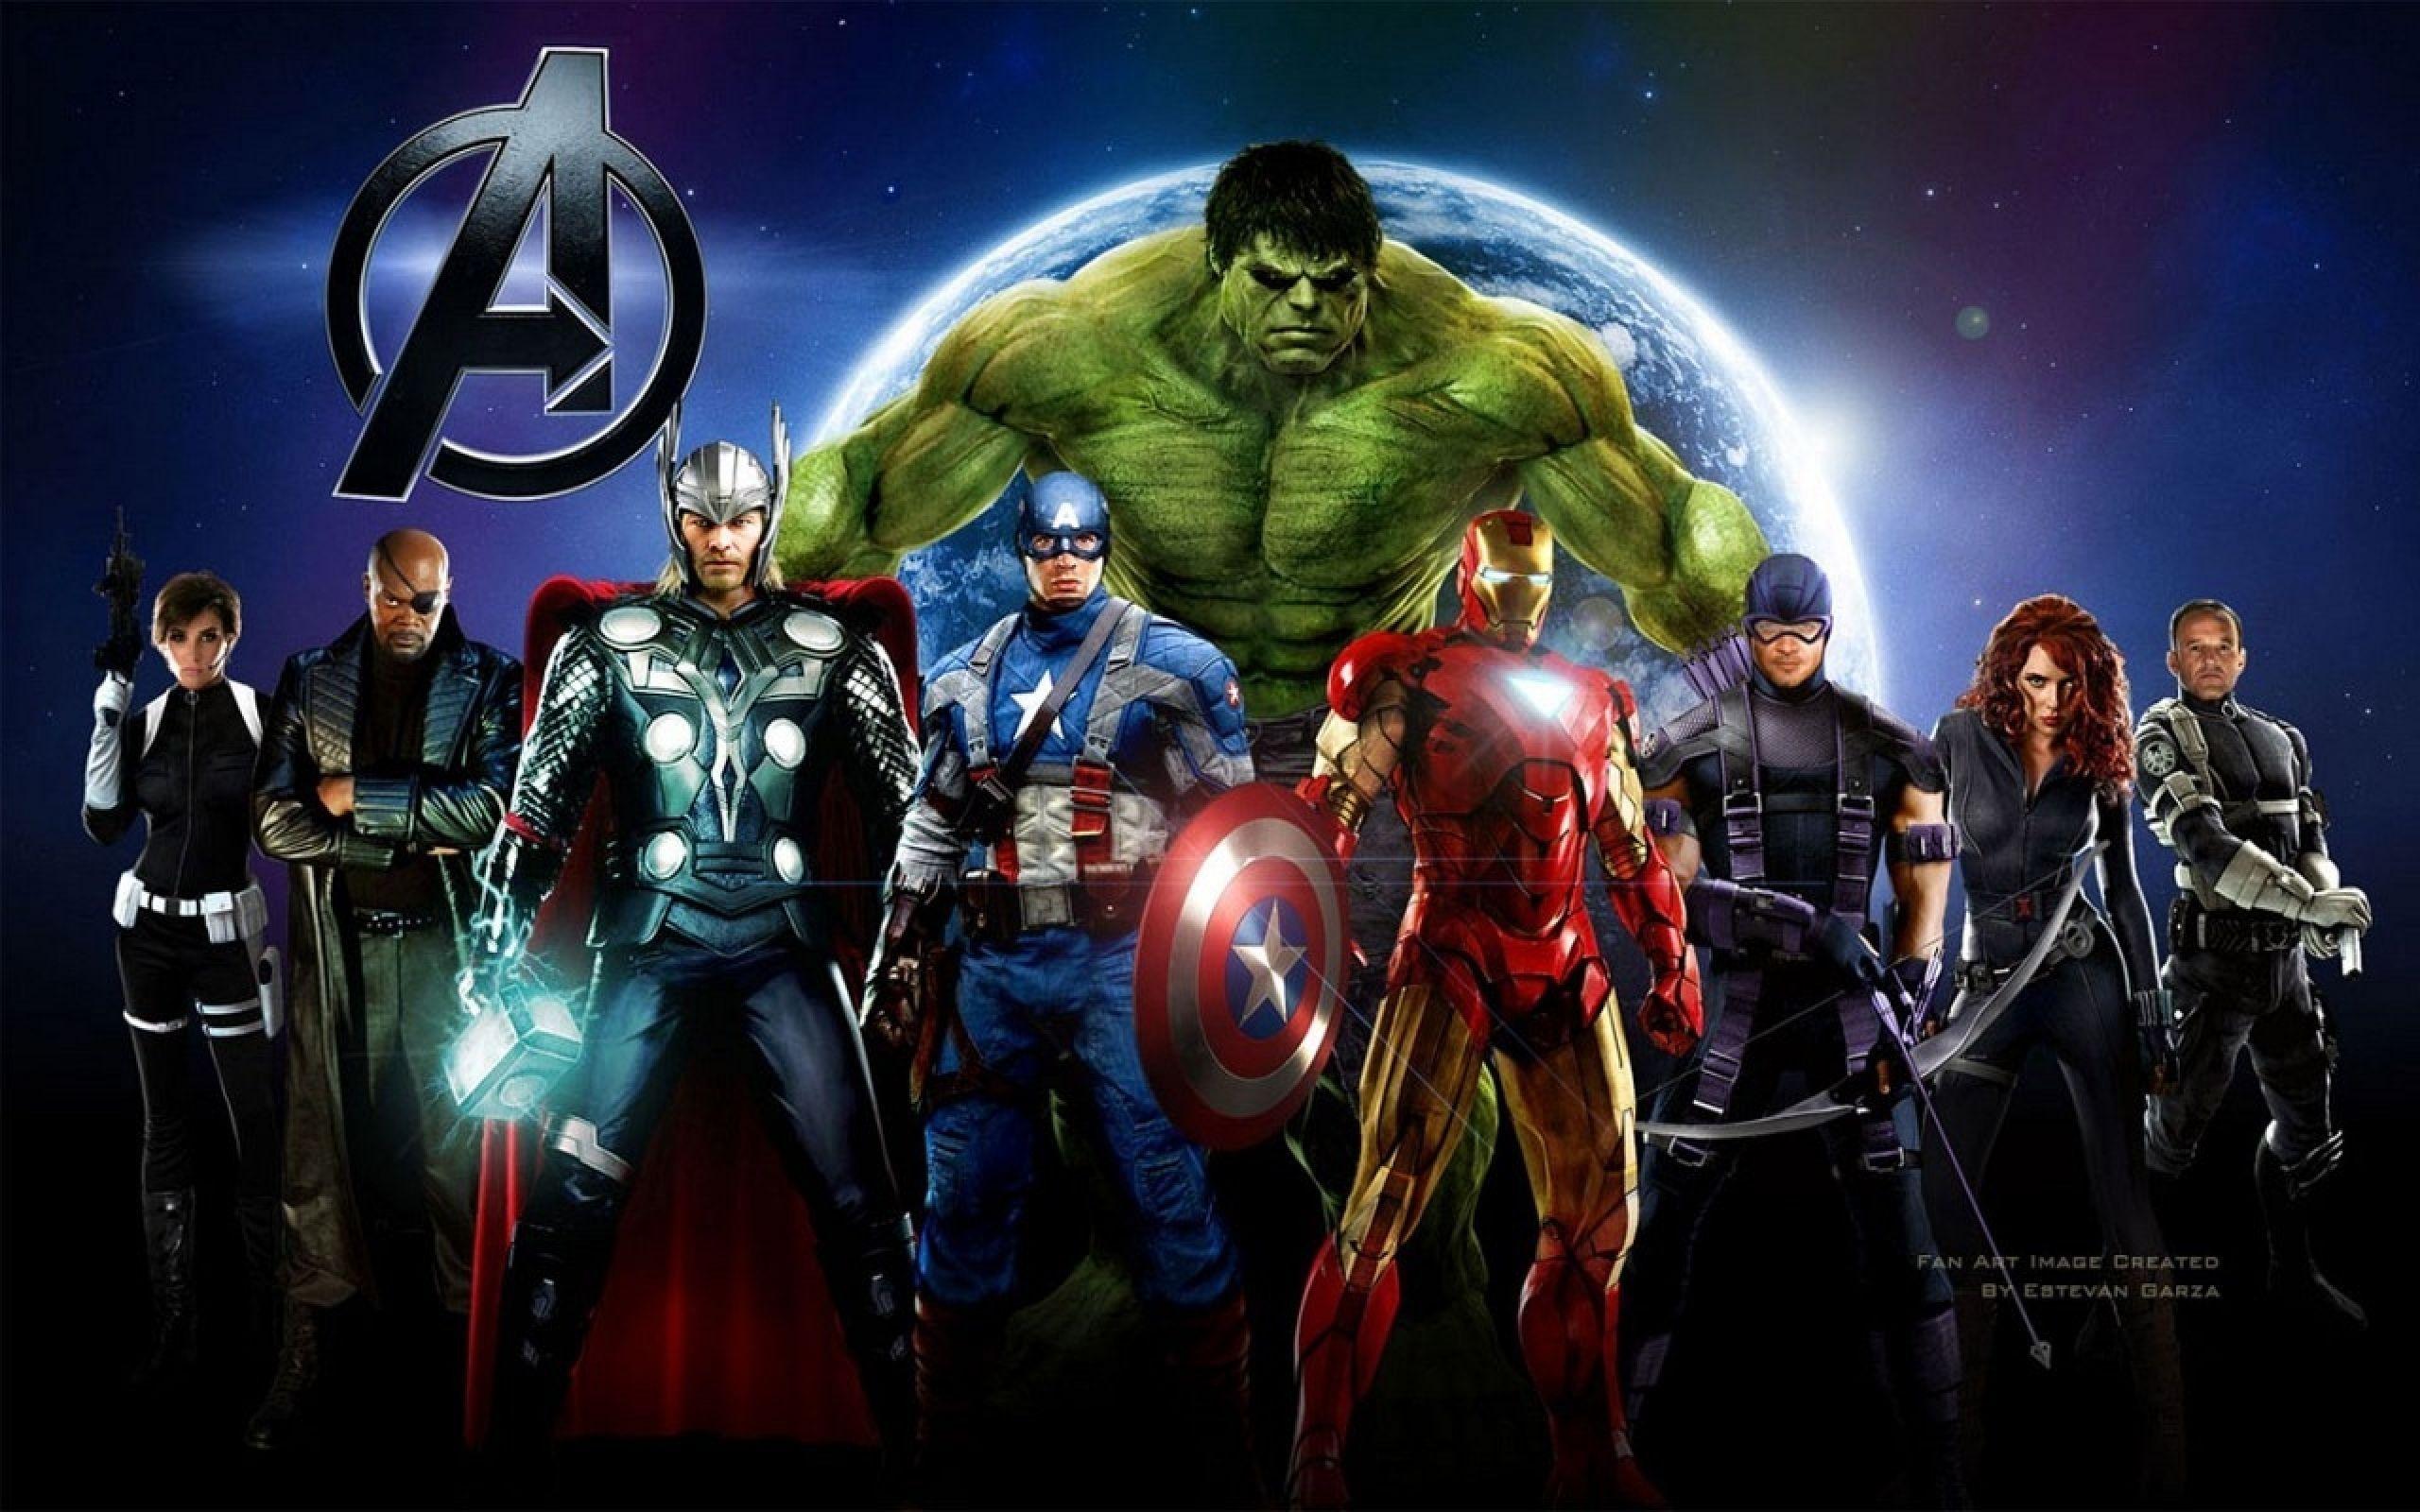 Hd wallpaper hero - Marvel Heroes Wallpapers Full Hd Wallpaper Search